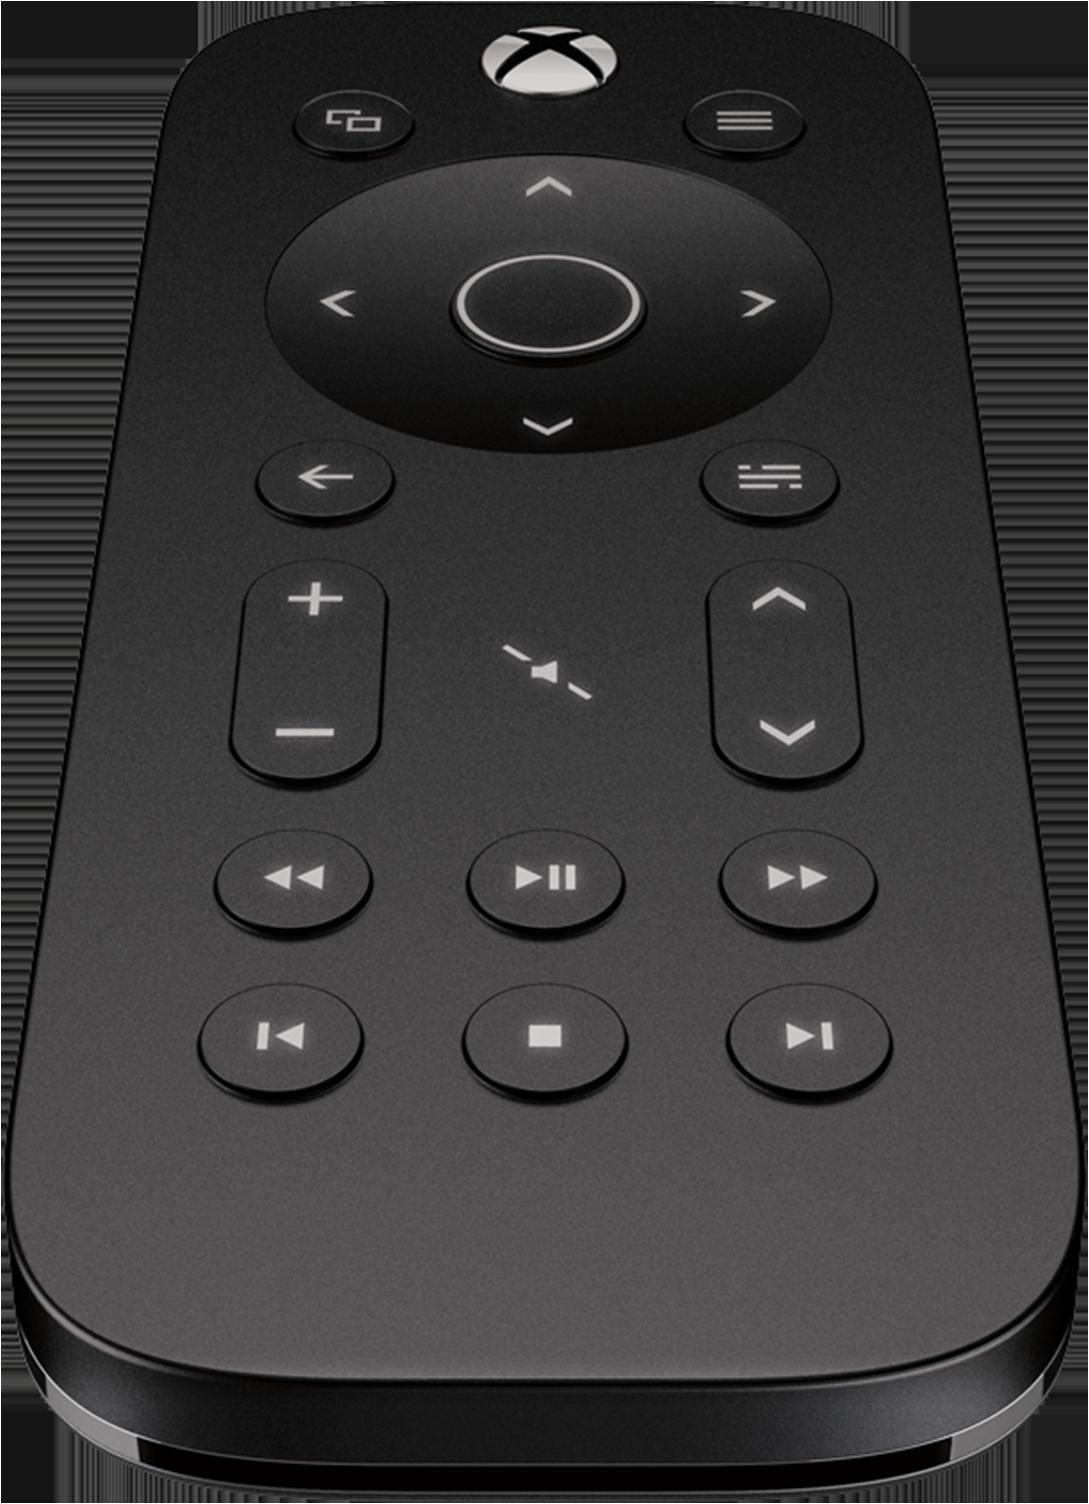 Xbox One Media Remote Deal